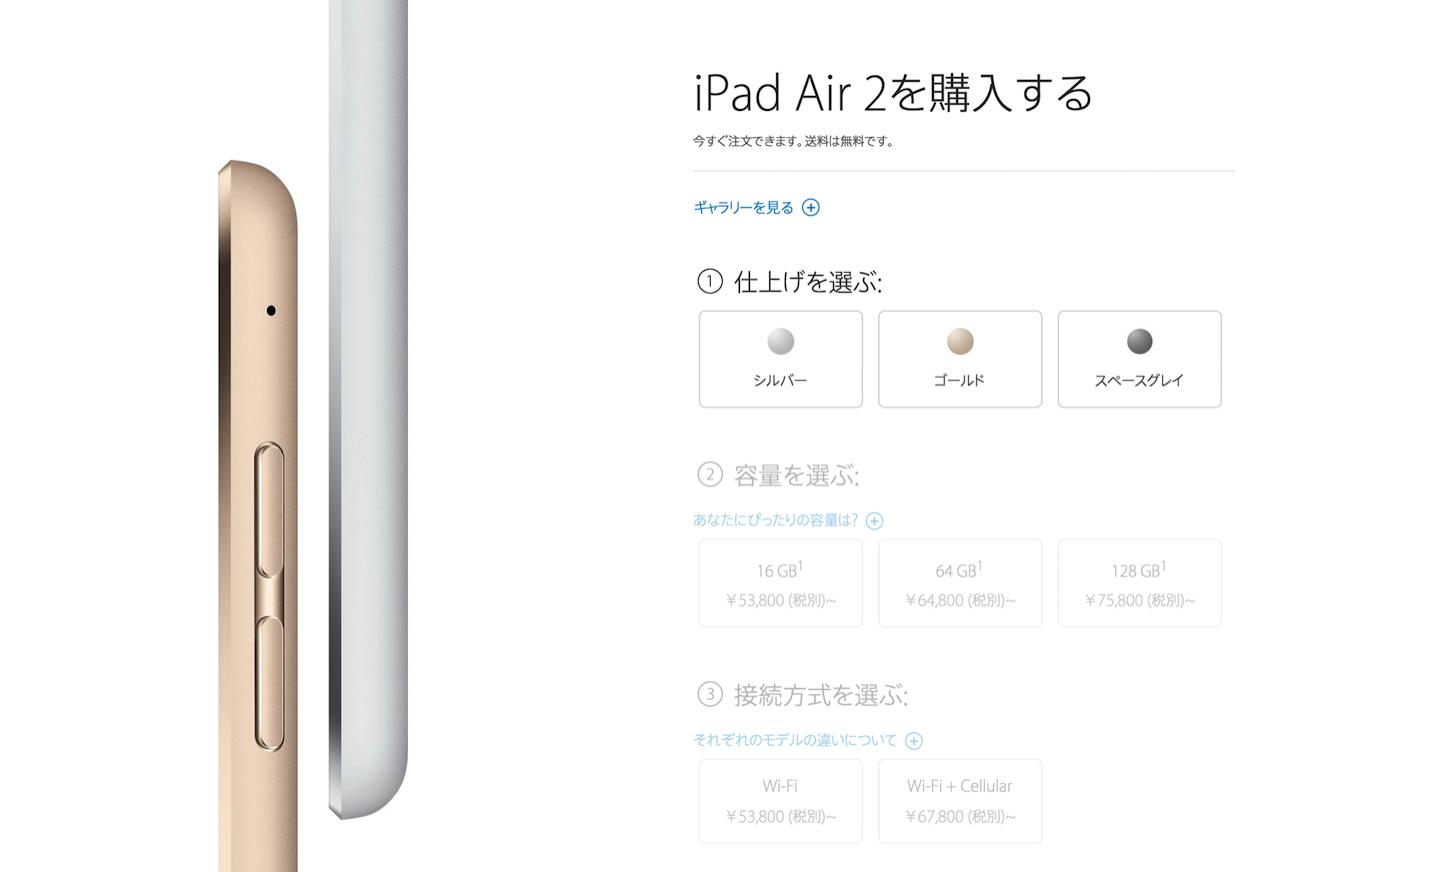 Buying ipad air 2